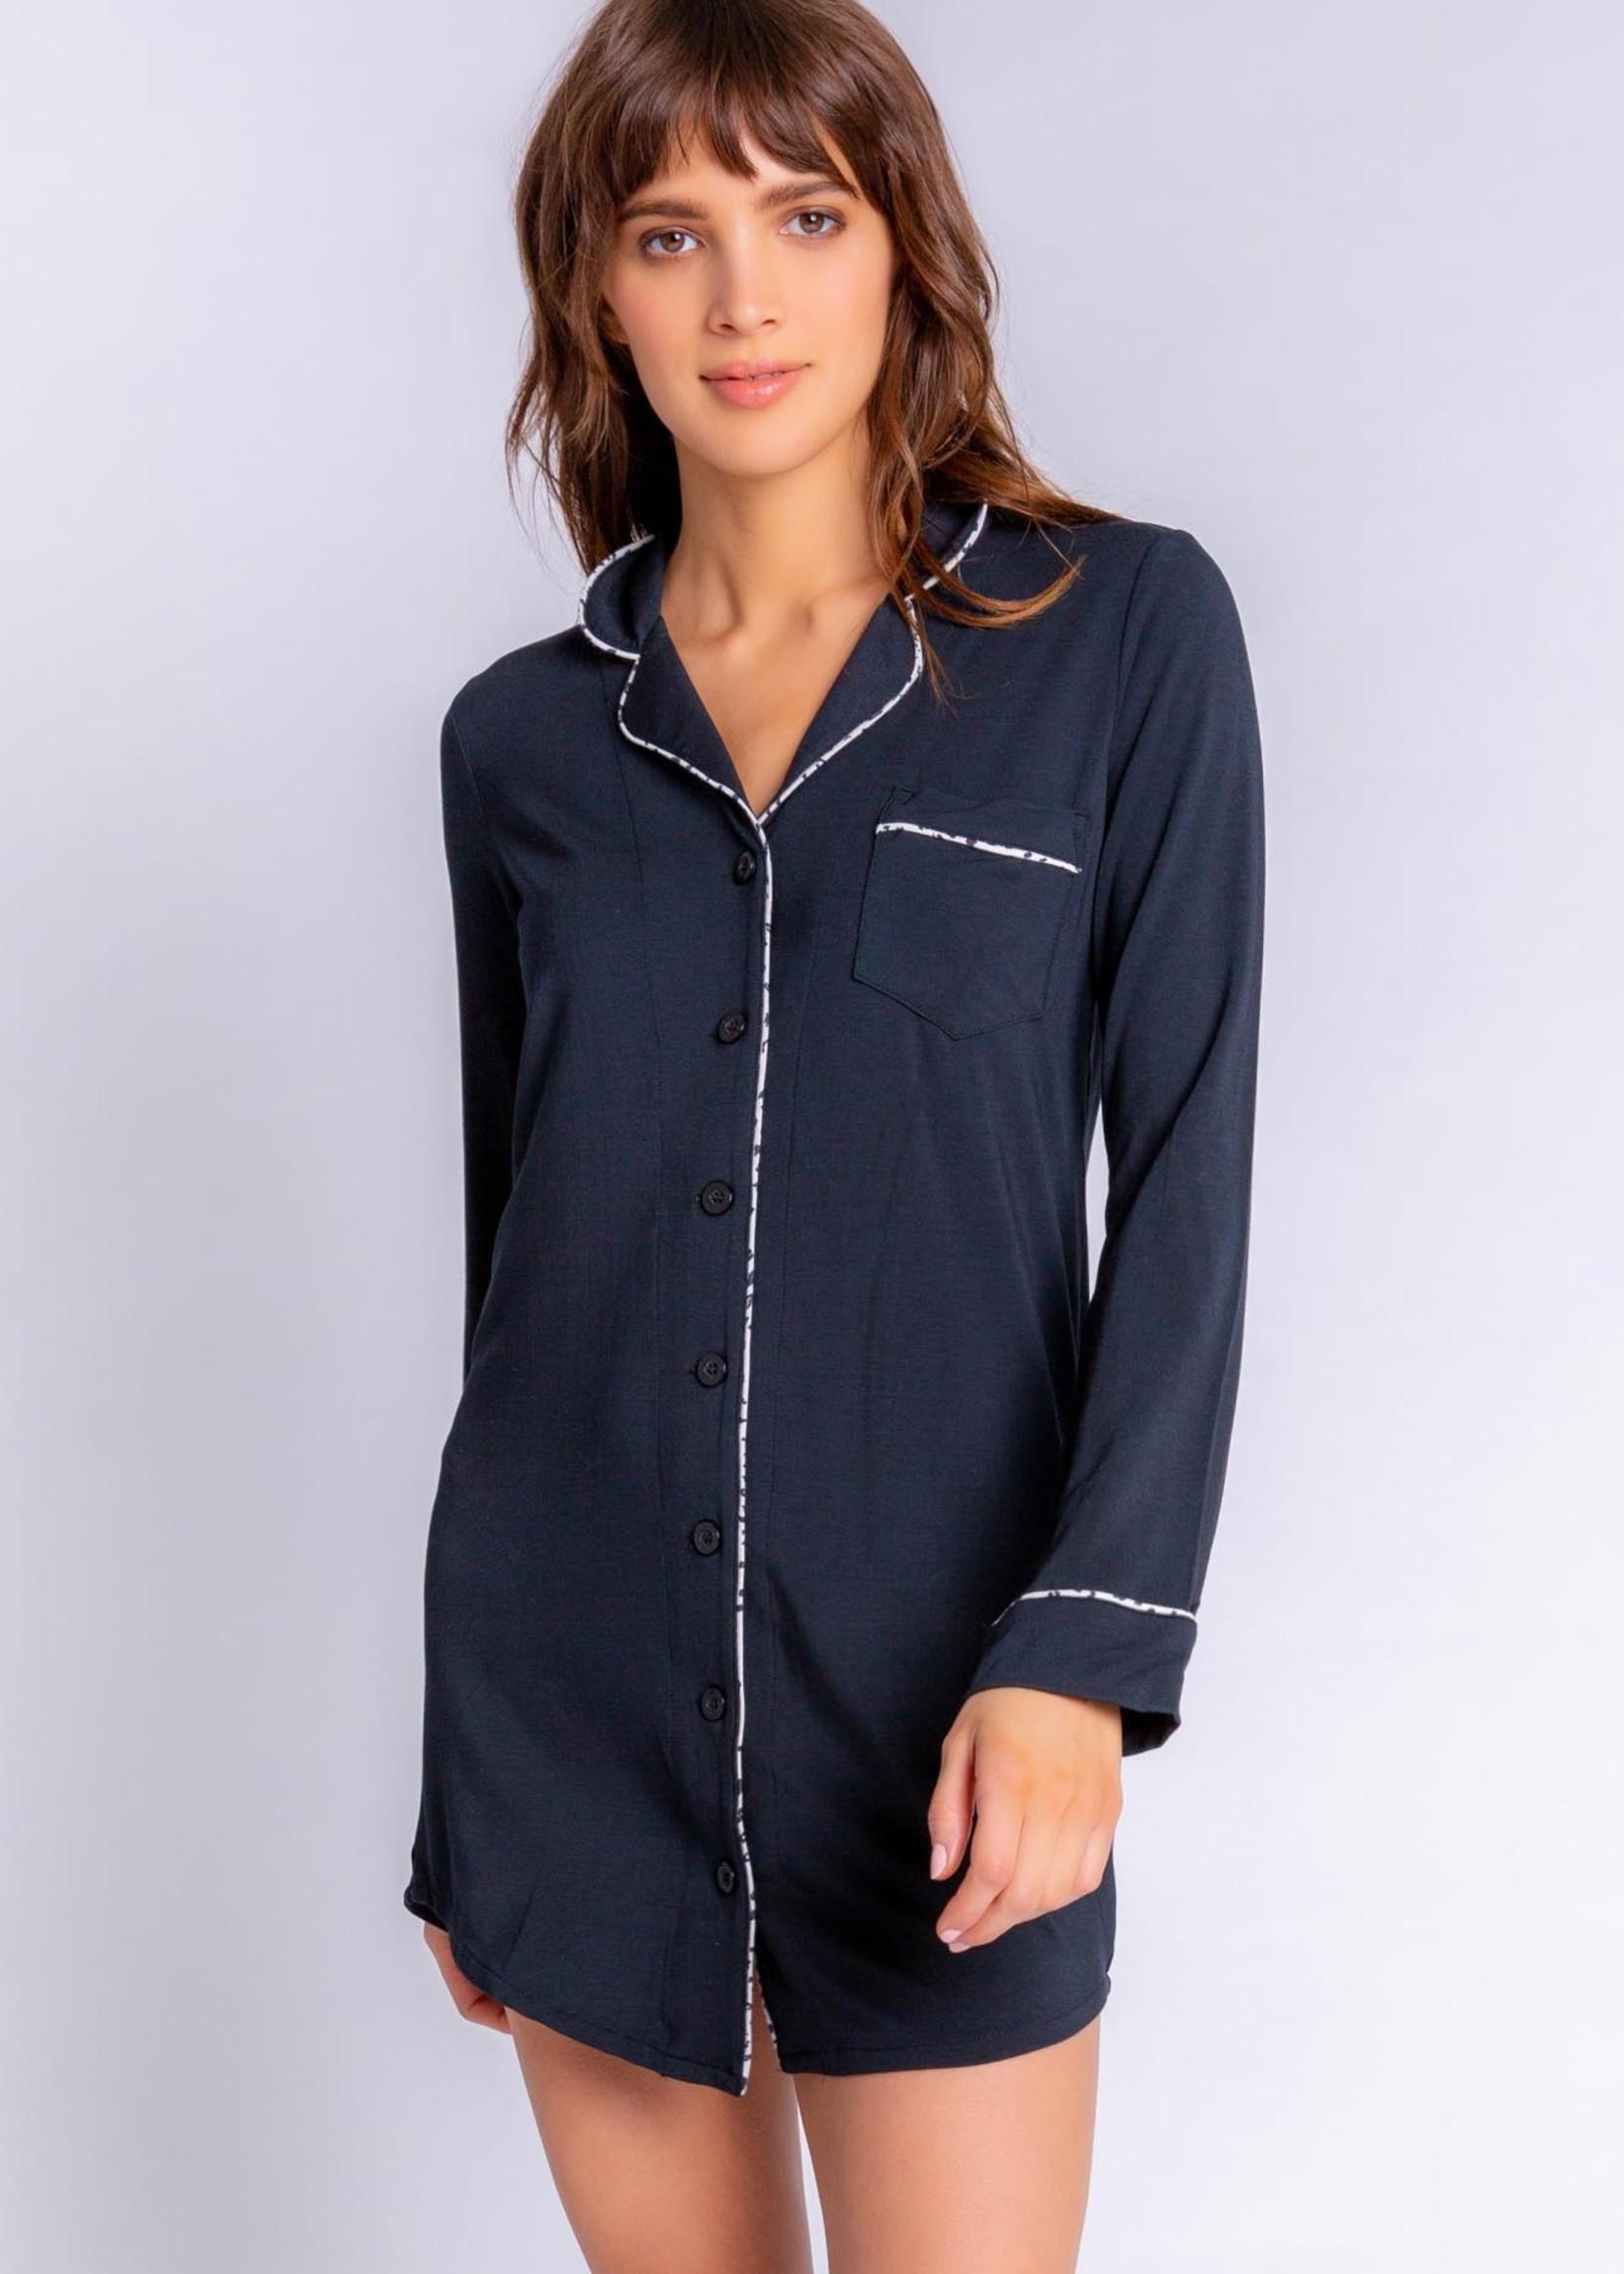 PJ Salvage Modal Basics Nightshirt